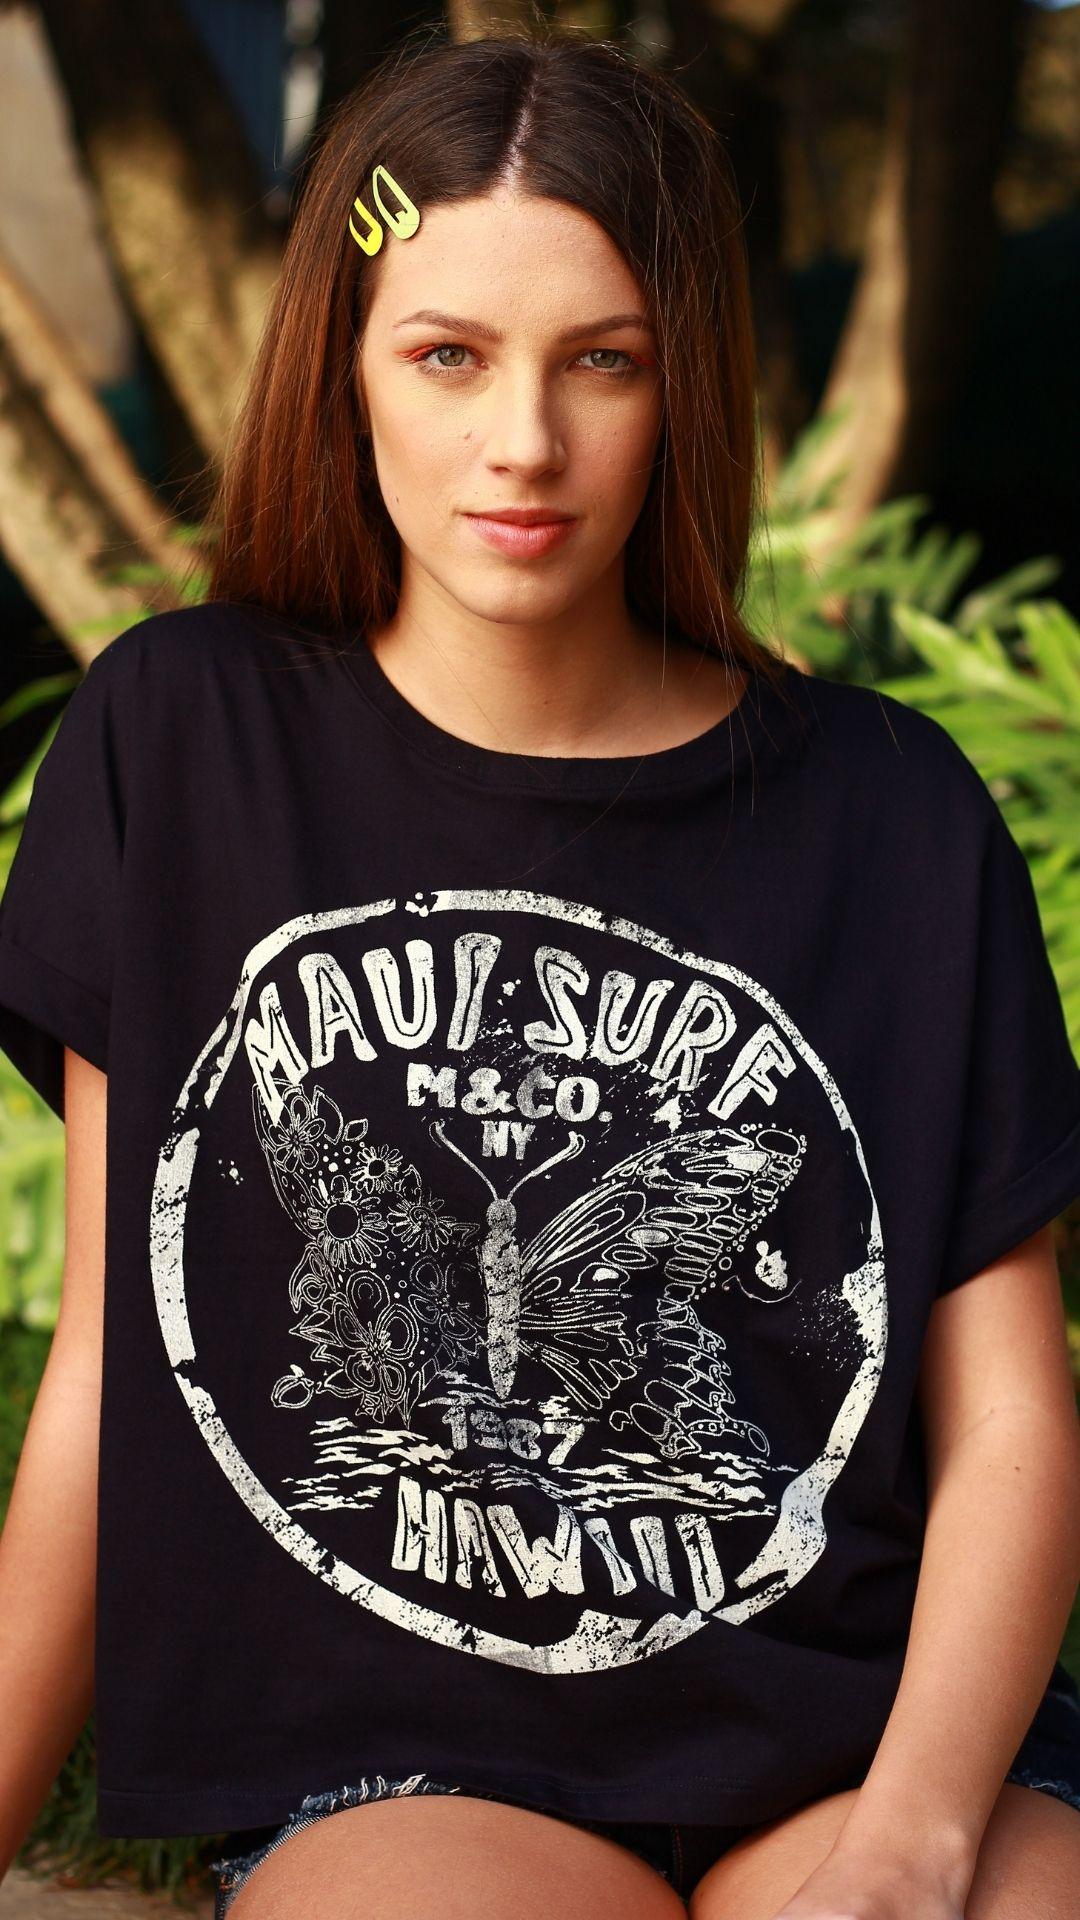 T-Shirt Maui Surf  - Metro & Co.